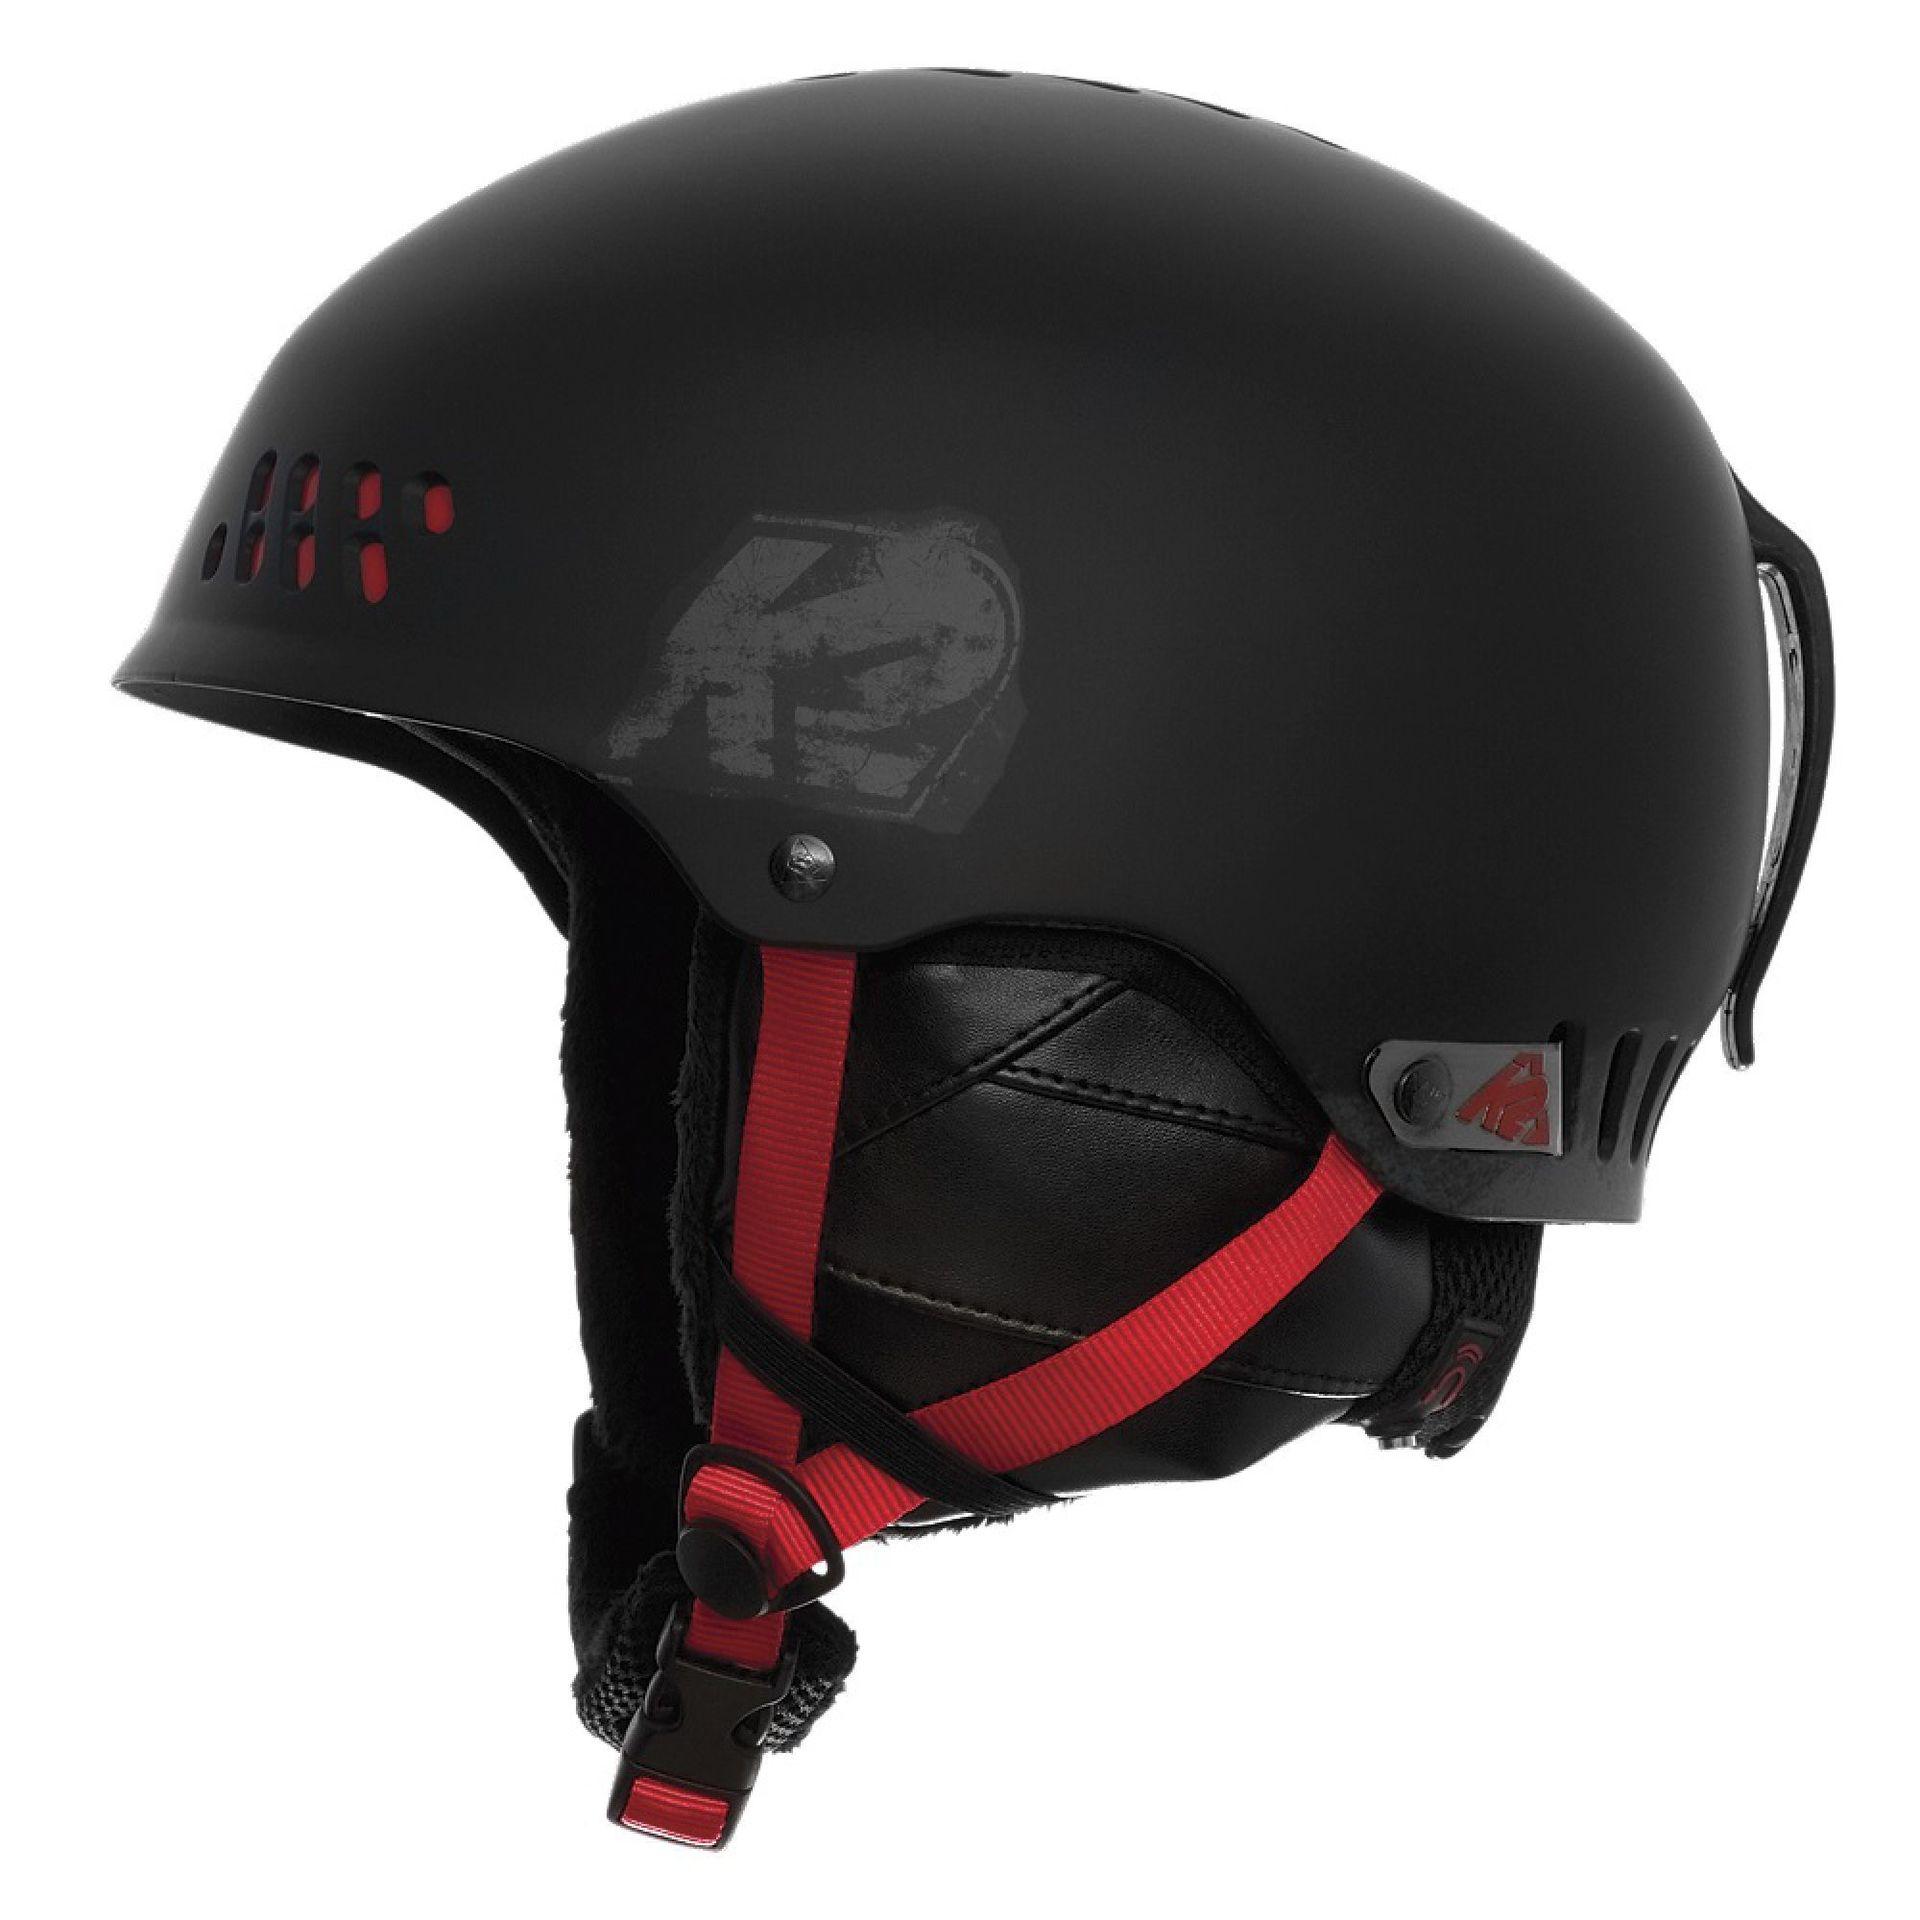 KASK K2 PHASE PRO BLACK|RED